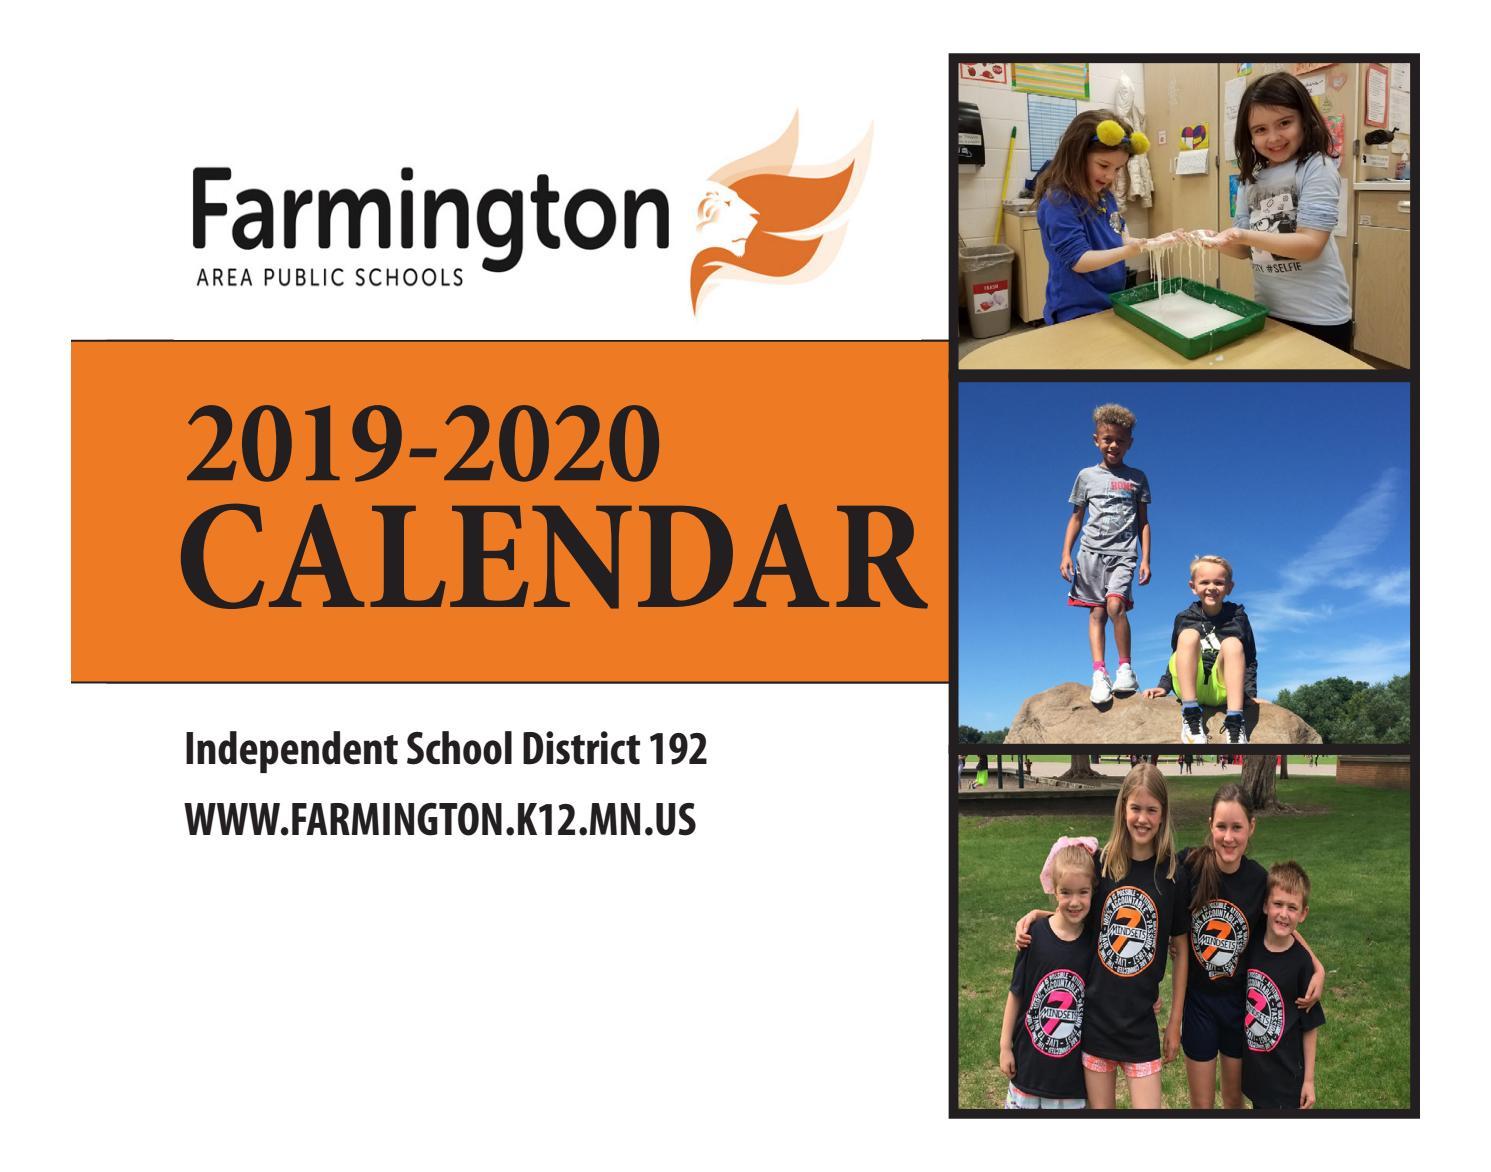 2019-2020 District 192 Calendarsally Mcconnaughey - Issuu